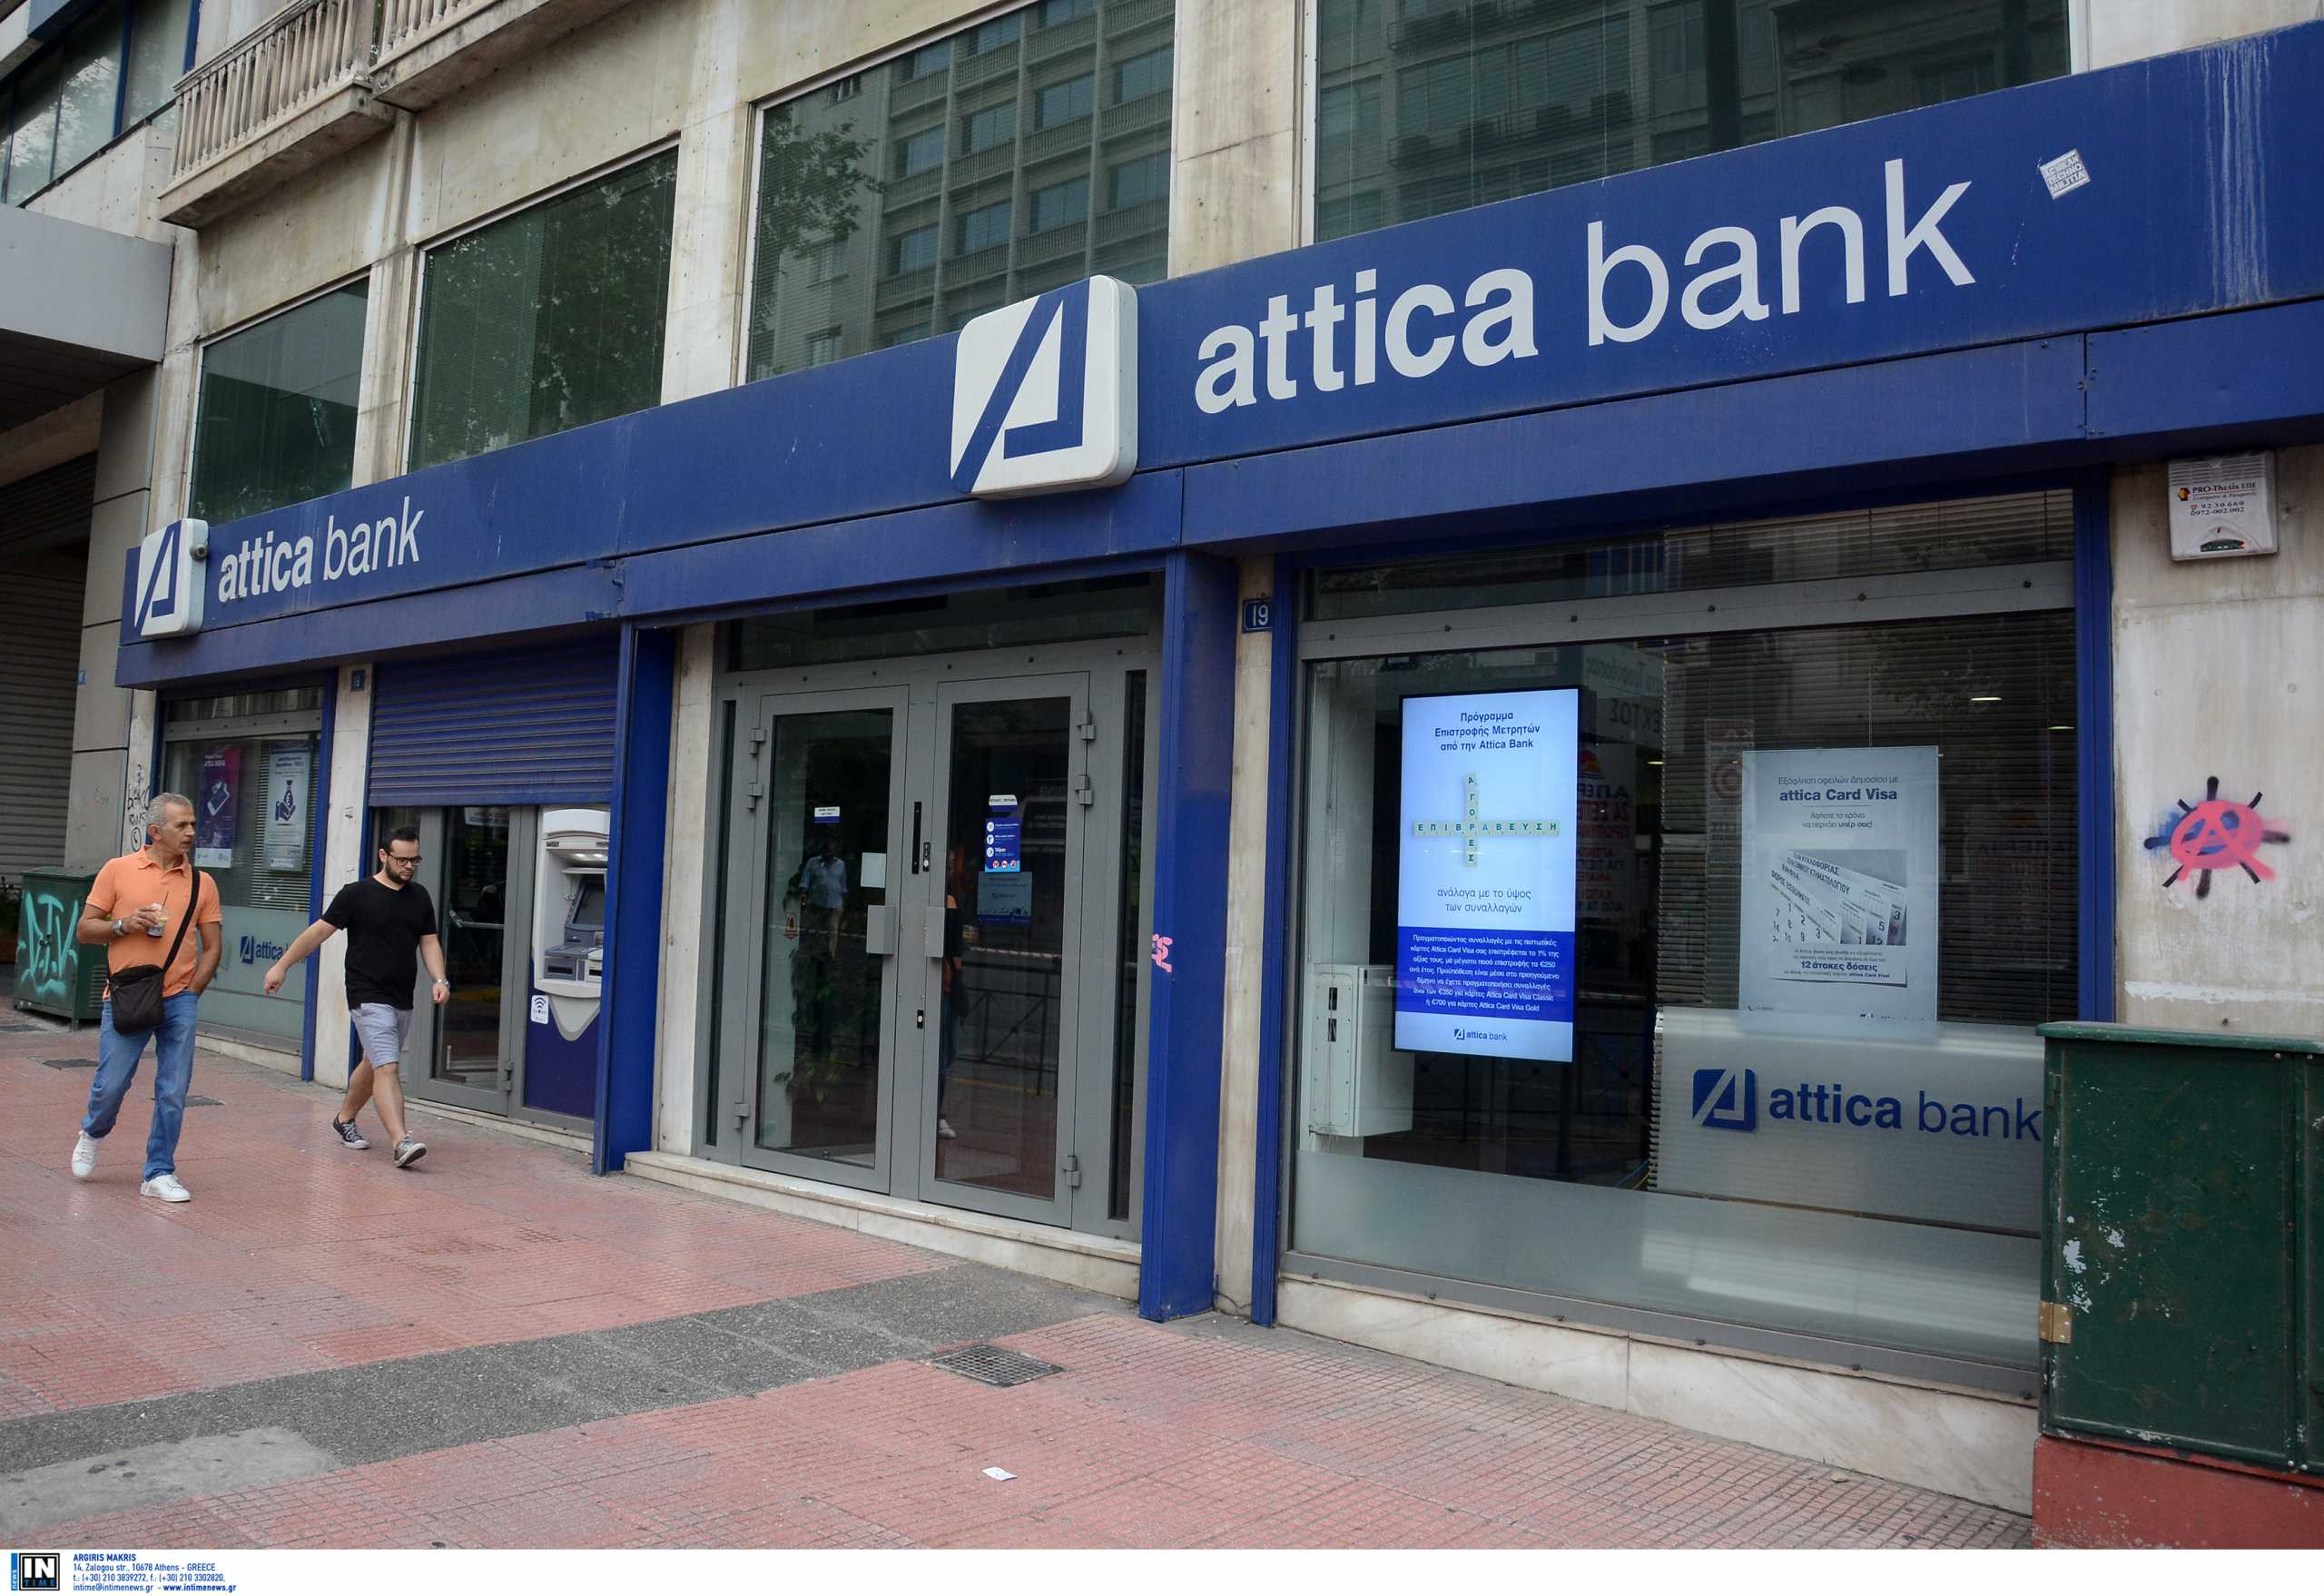 Attica Bank – Κωνσταντίνος Μακέδος: «Η τράπεζα γυρίζει σελίδα και η ελληνική οικονομία ανταποκρίνεται σε δυναμική πορεία»